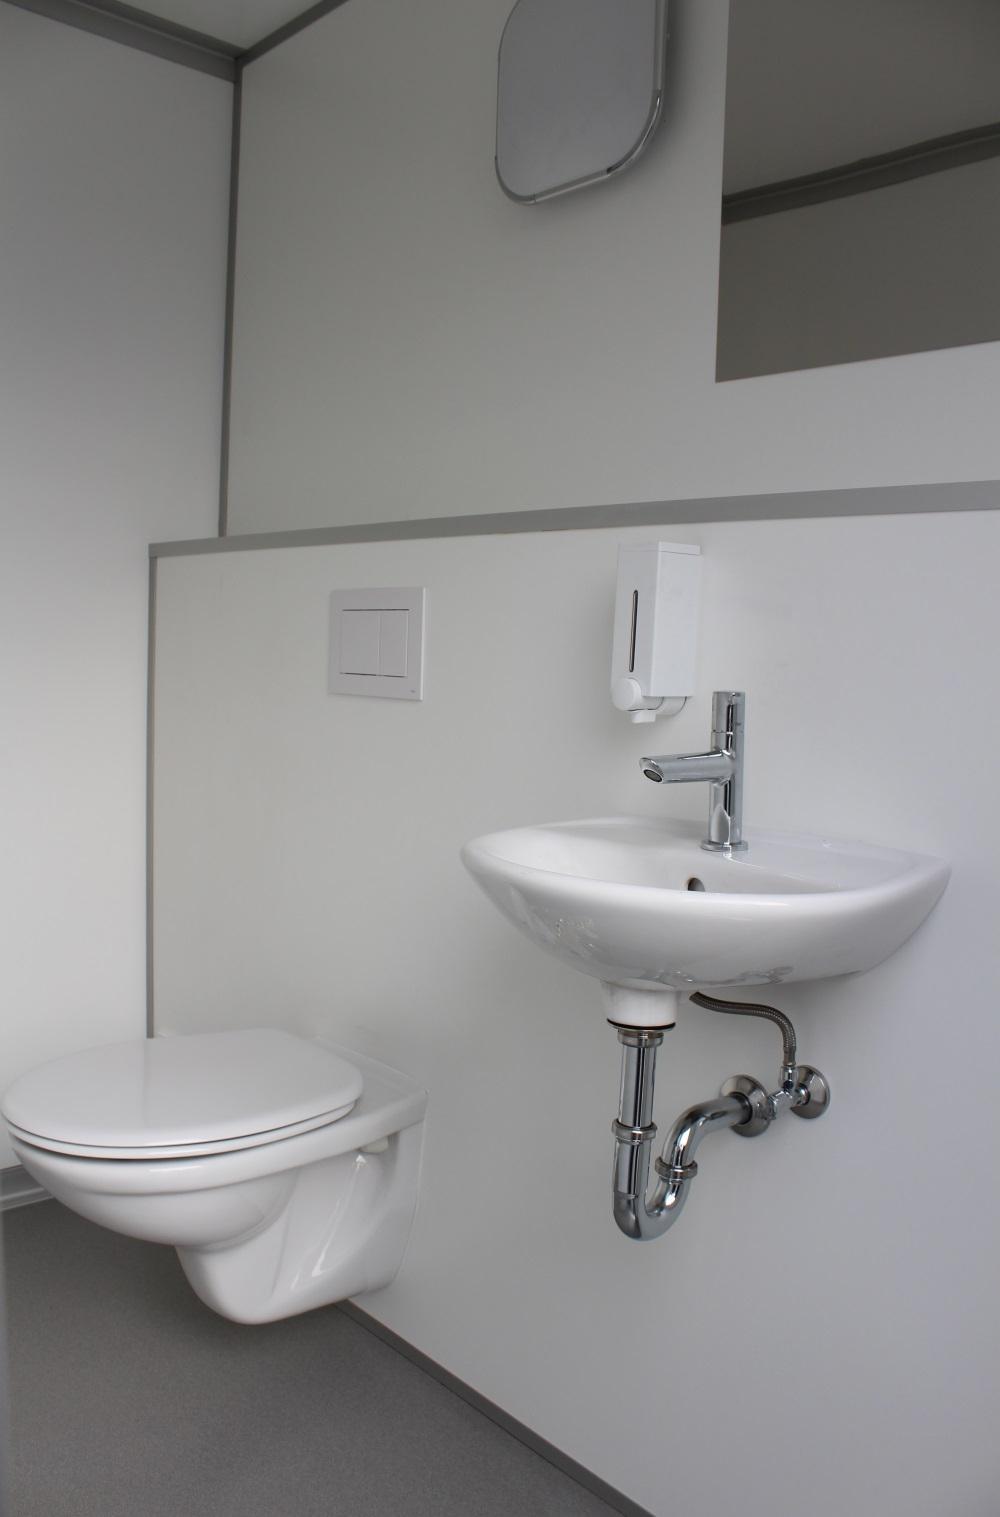 1 1 toilettenwagen wc wagen damen herren neu. Black Bedroom Furniture Sets. Home Design Ideas